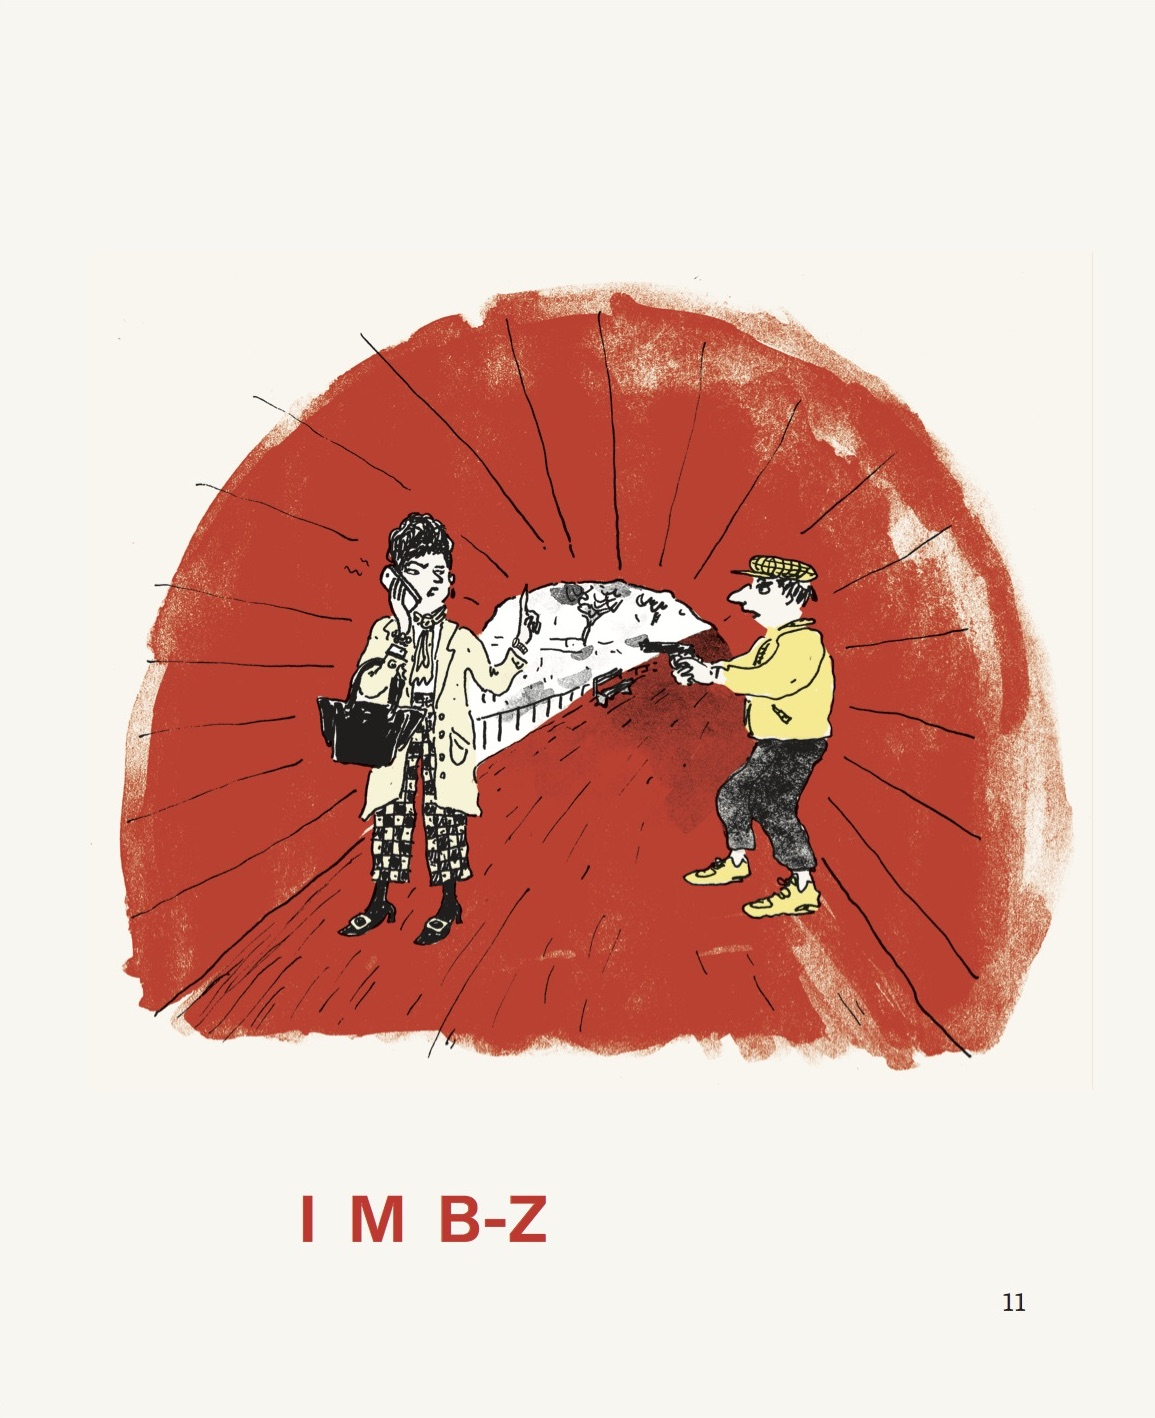 I M B-Z illustration copy